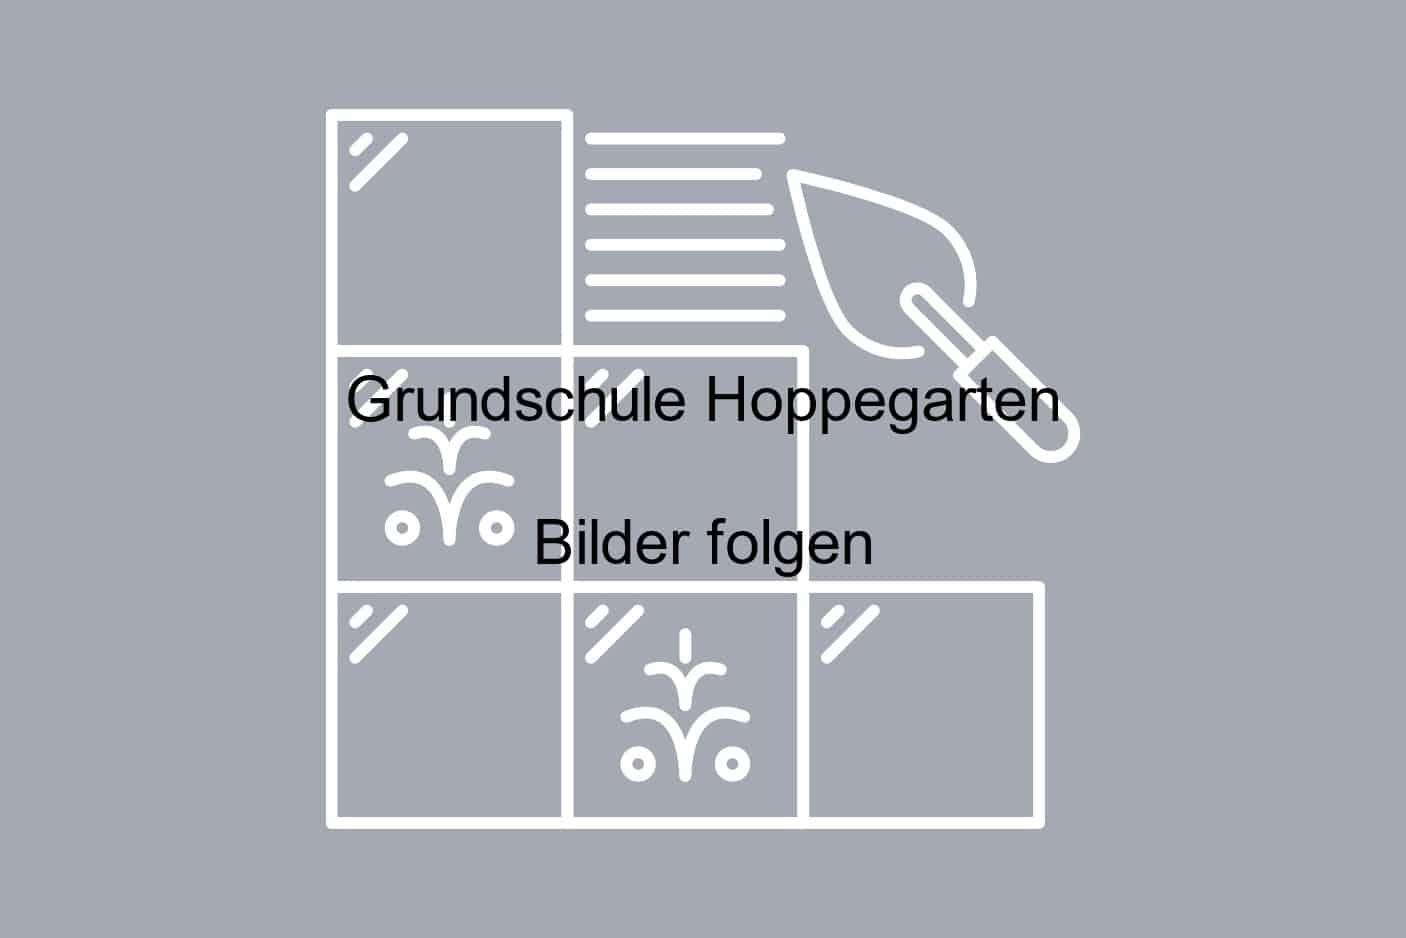 Grundschule Hoppegarten - BFD Berlin Fliesendesign